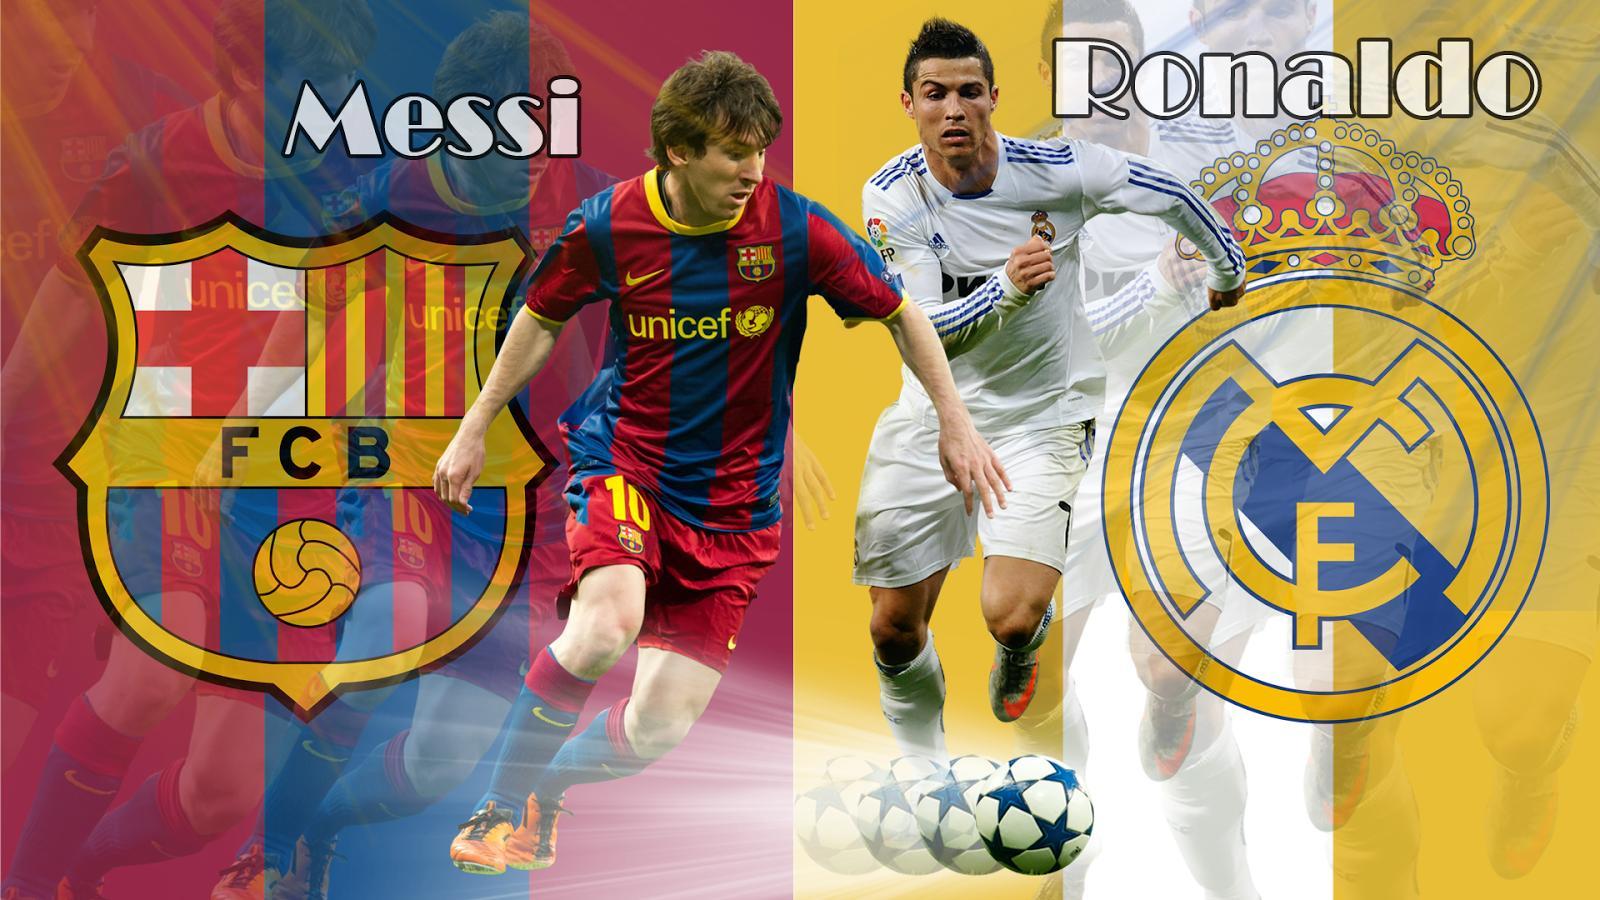 Messi Barcelona Vs Ronaldo Madrid Wallpaper   Football HD Wallpapers 1600x900